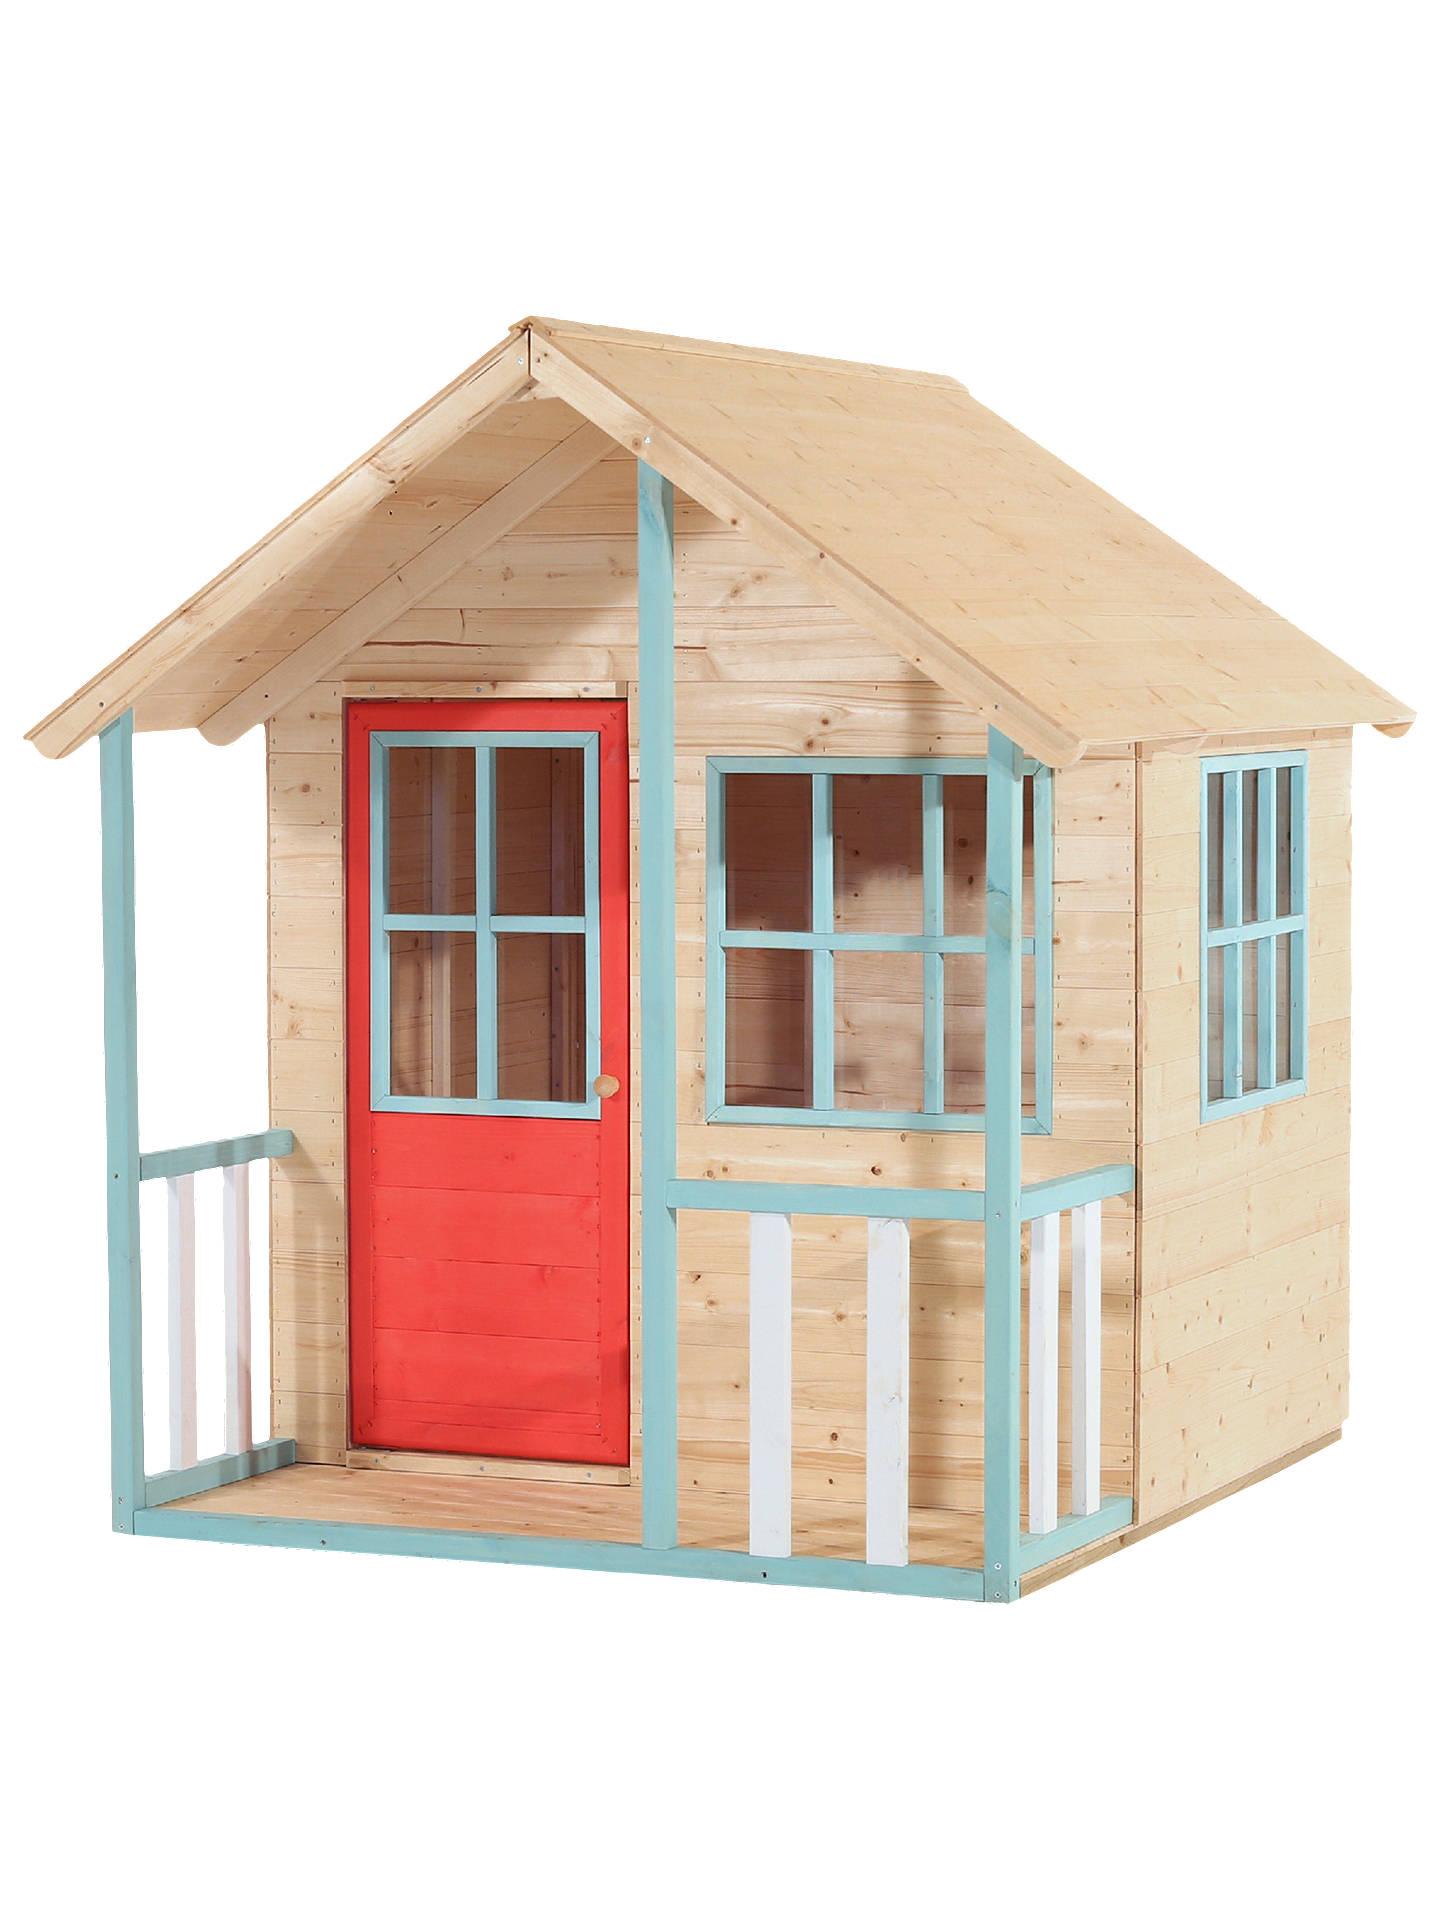 Sensational Tp Toys Alpine Cottage Playhouse Brown Download Free Architecture Designs Intelgarnamadebymaigaardcom